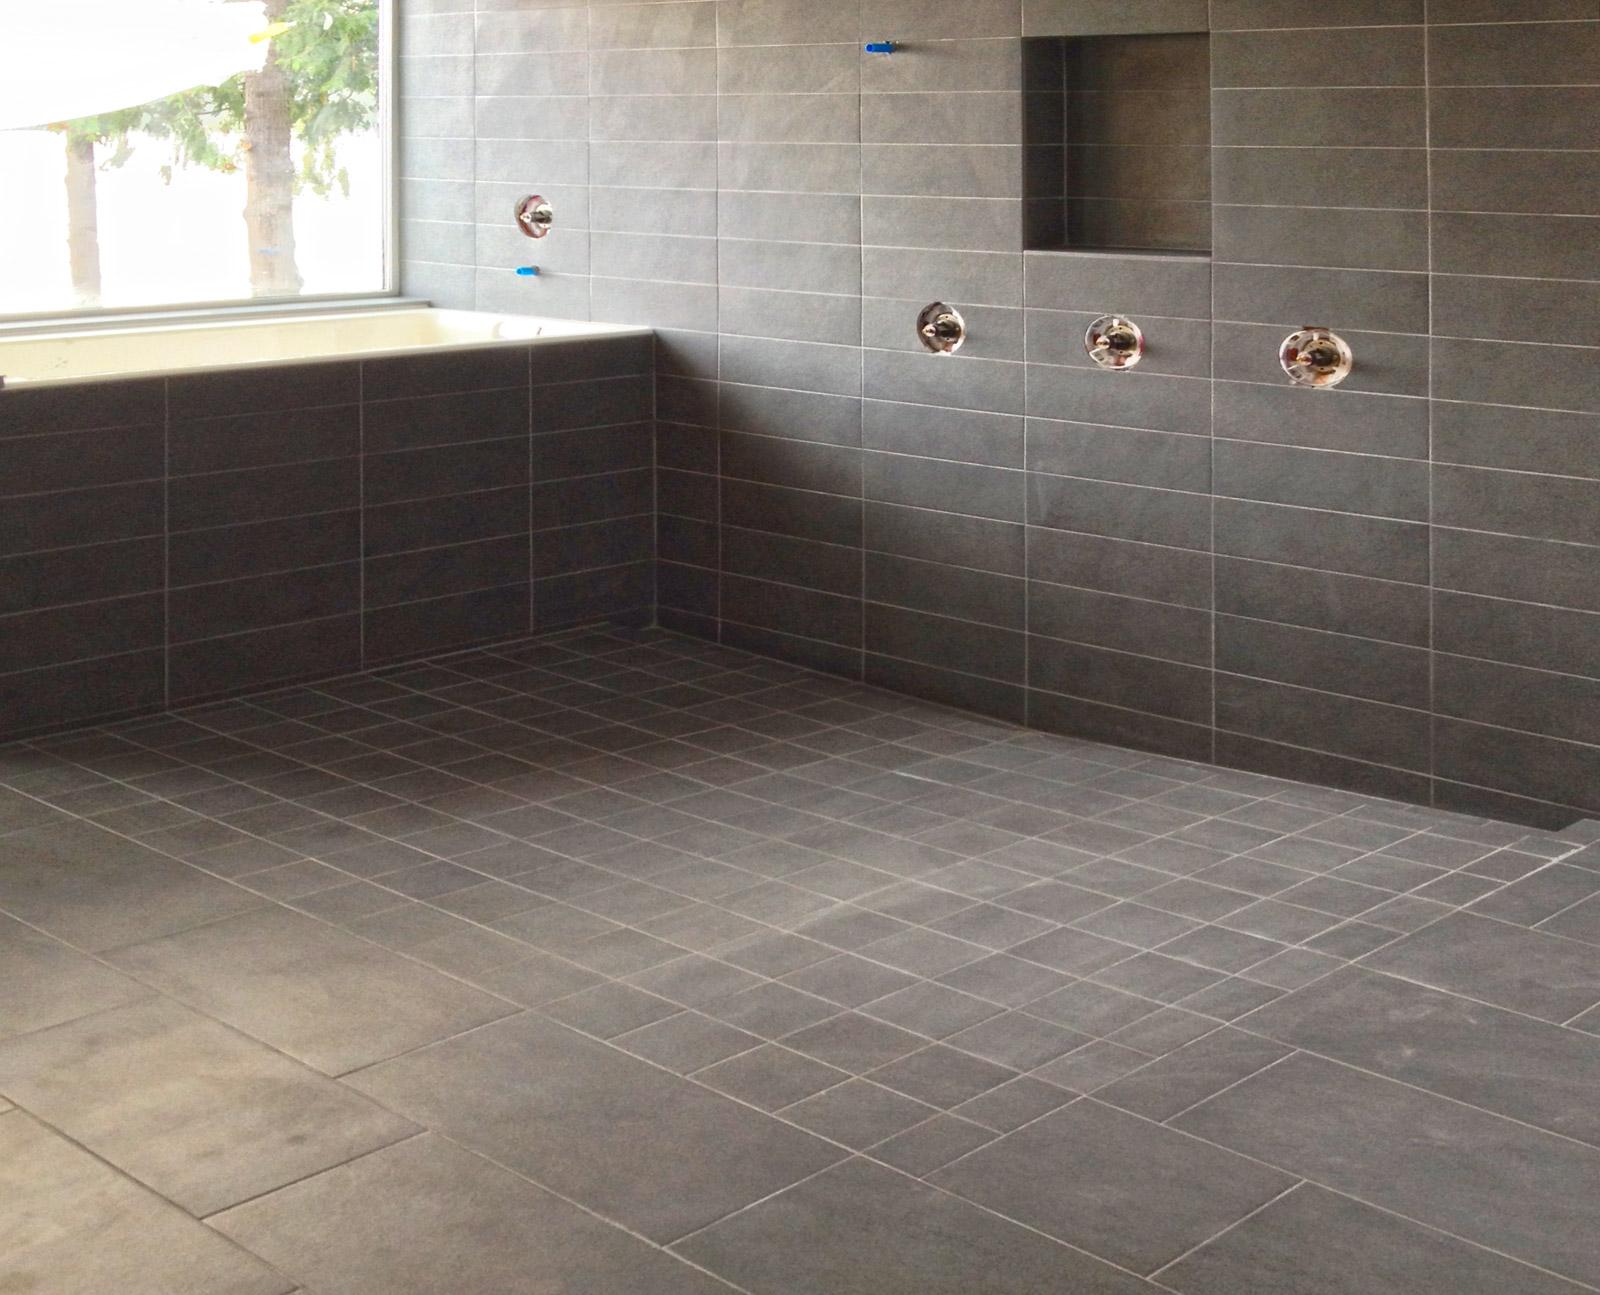 Dorpel Badkamer Holonite : Douche dorpel rubber rubber duck bathroom decor